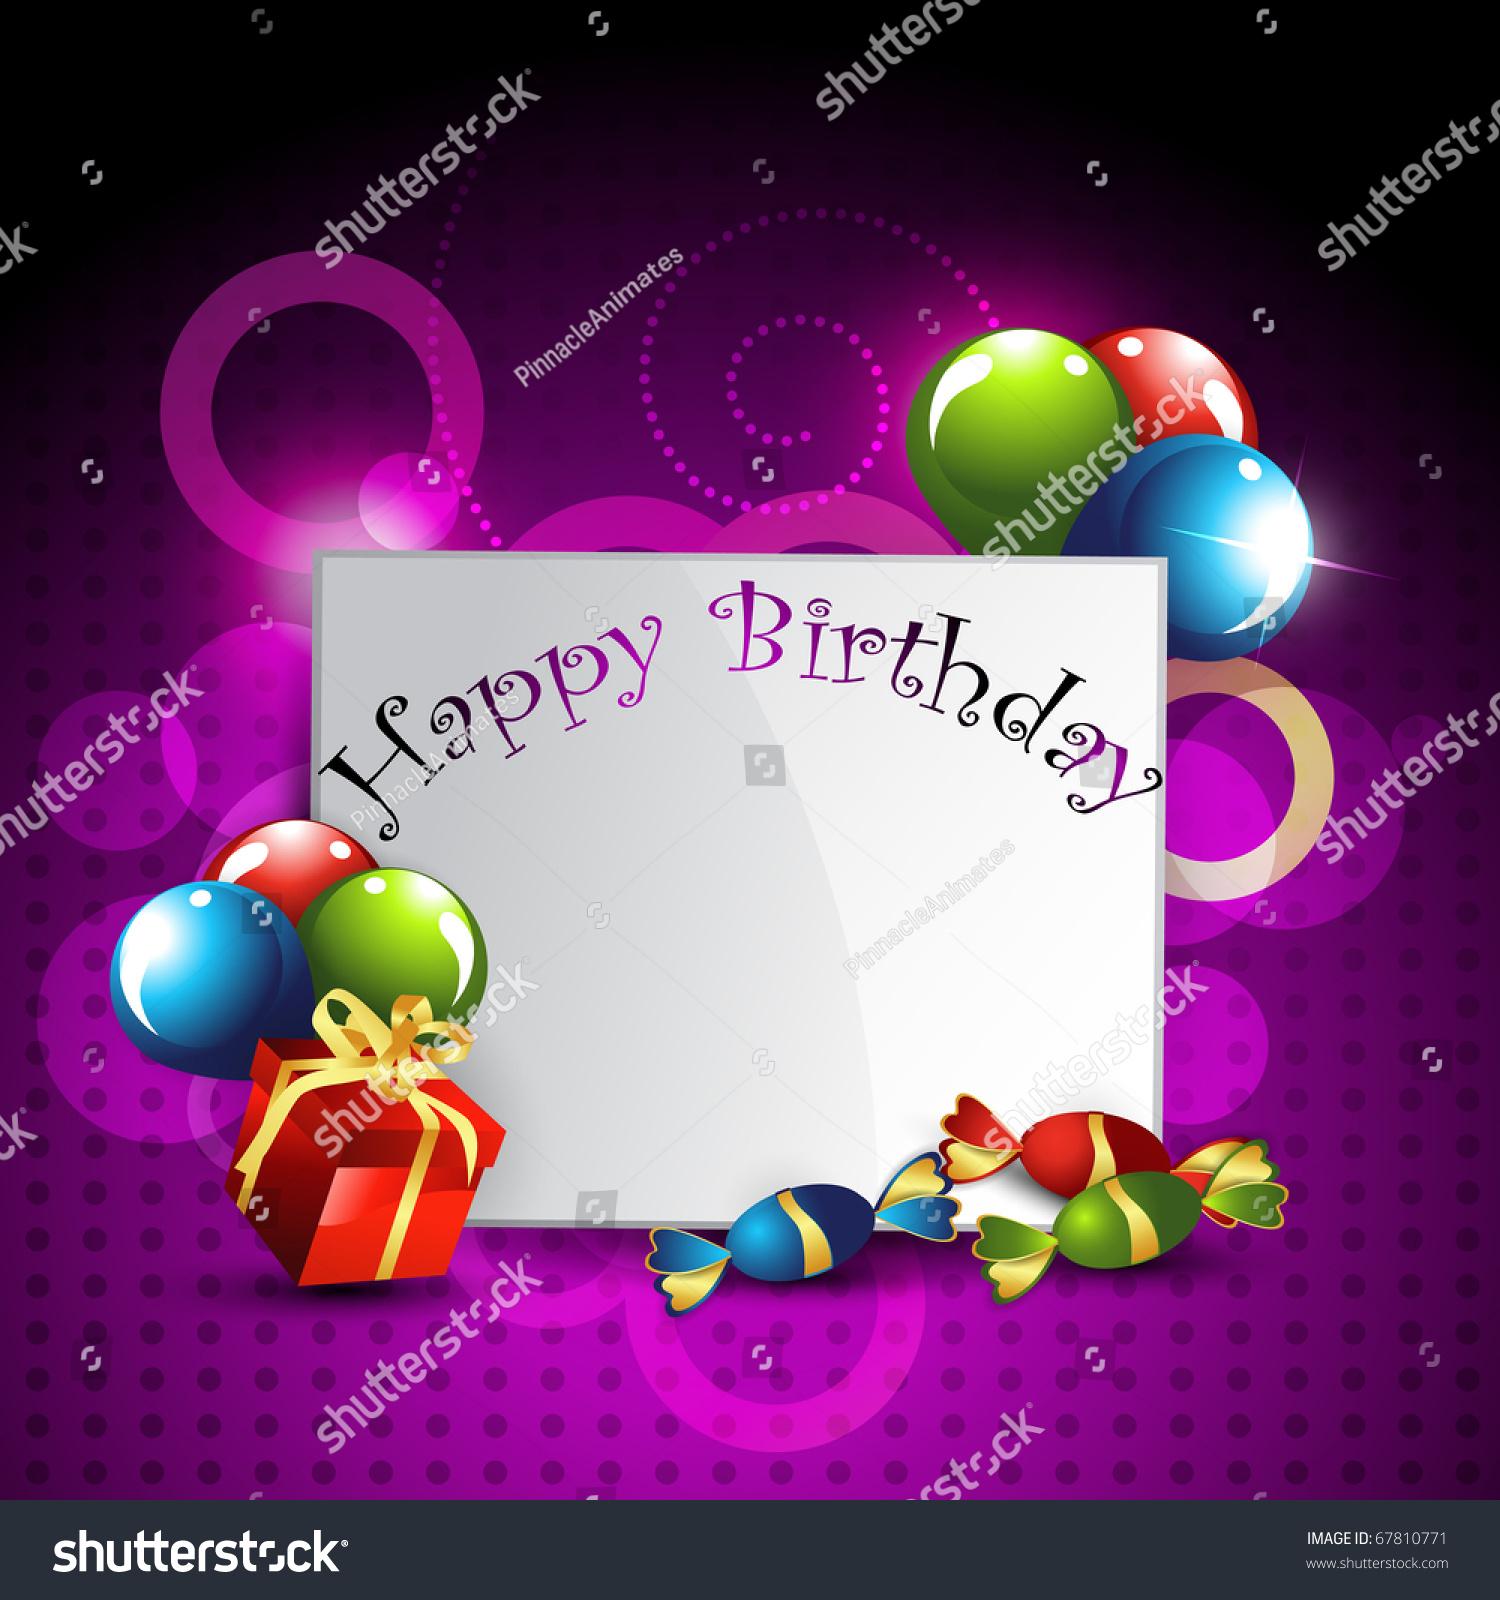 Vector Birthday Banner Design Art Stock Vector 67810771